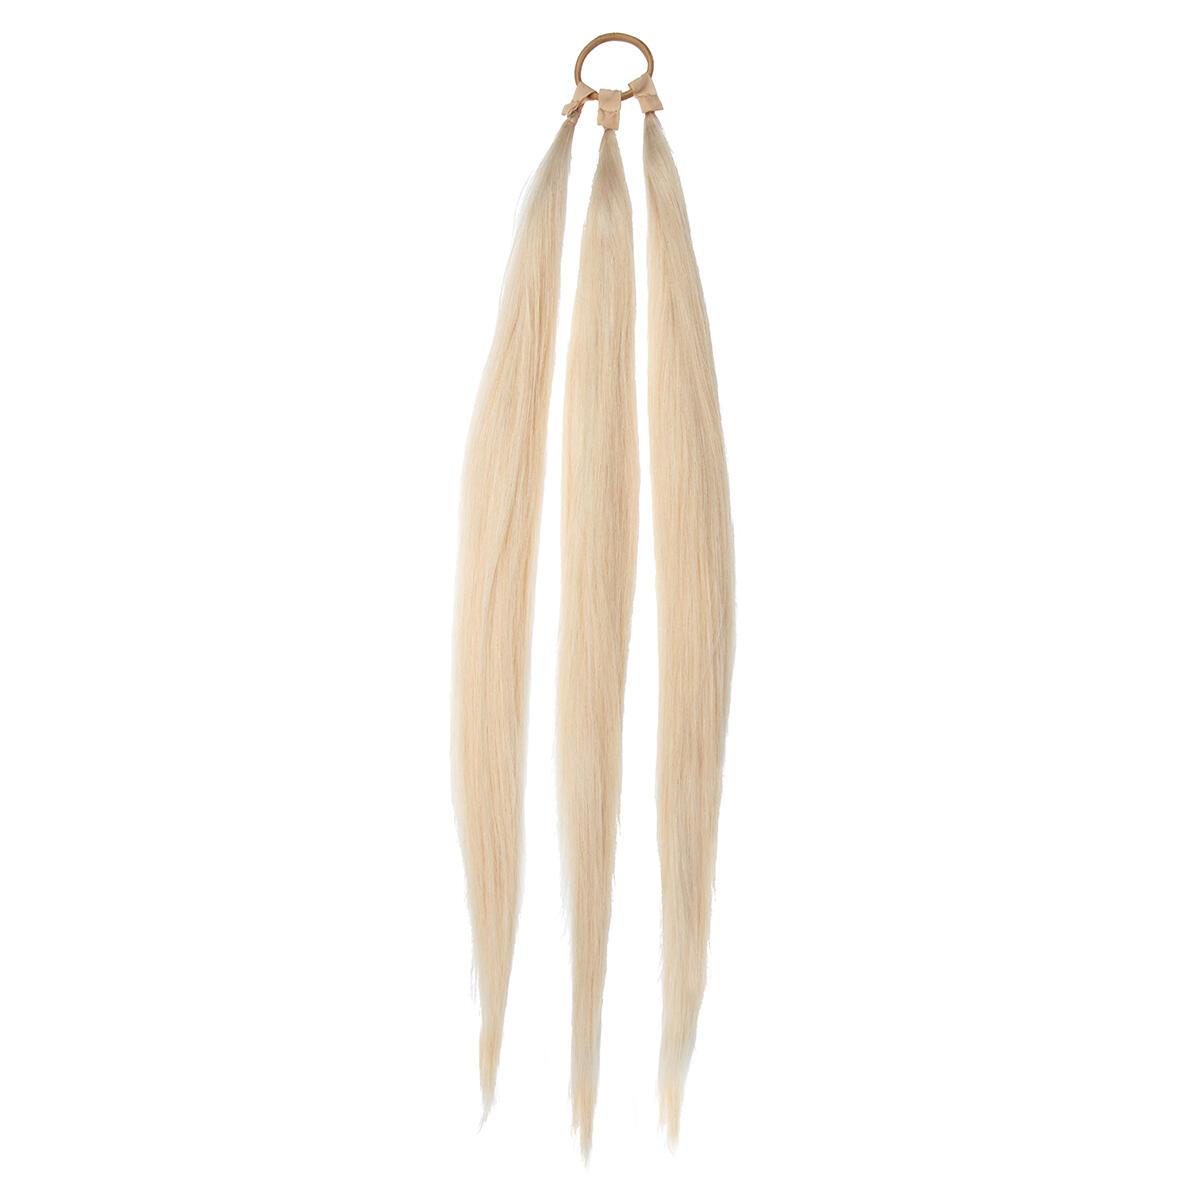 Rapunzel® Extensions Easy Braid Original 10.8 Light Blonde 55 cm